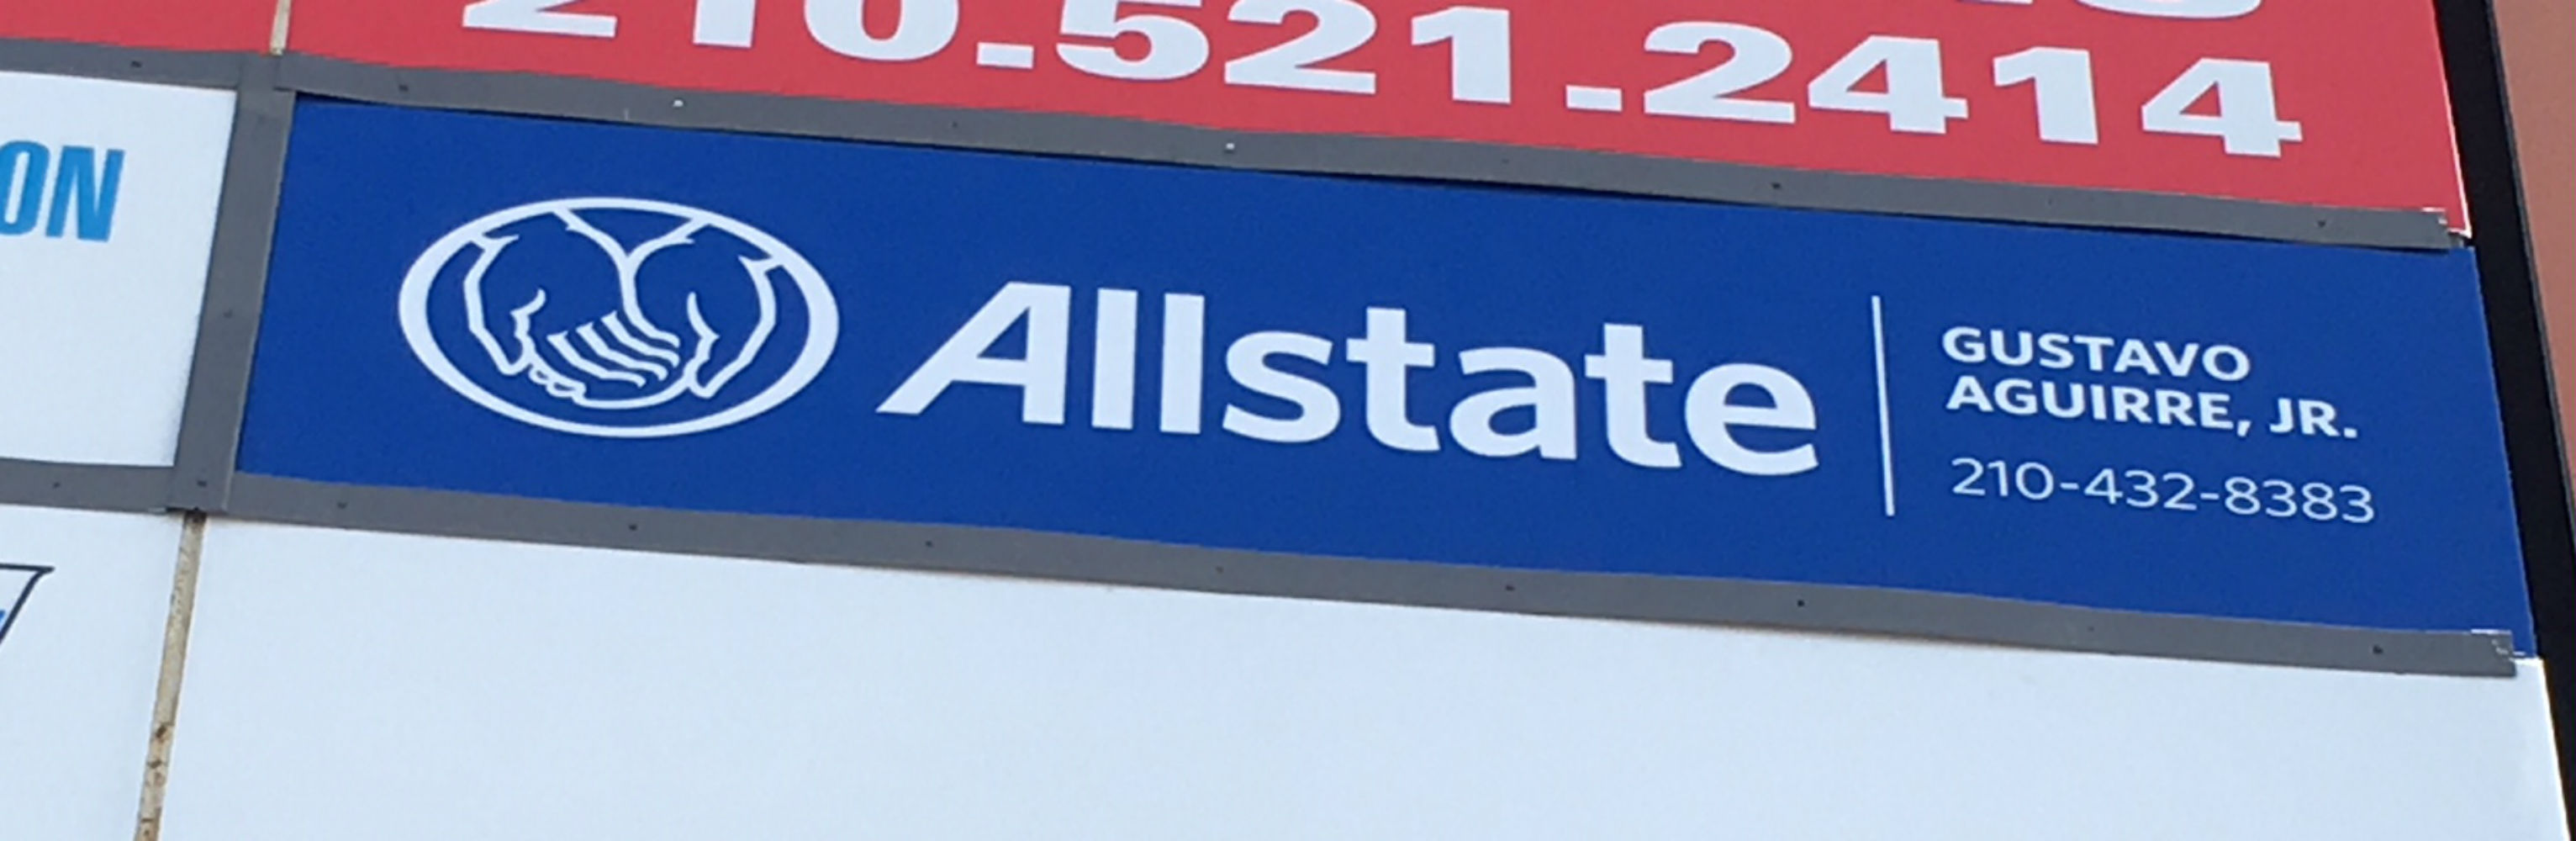 Gustavo Aguirre Jr: Allstate Insurance image 1